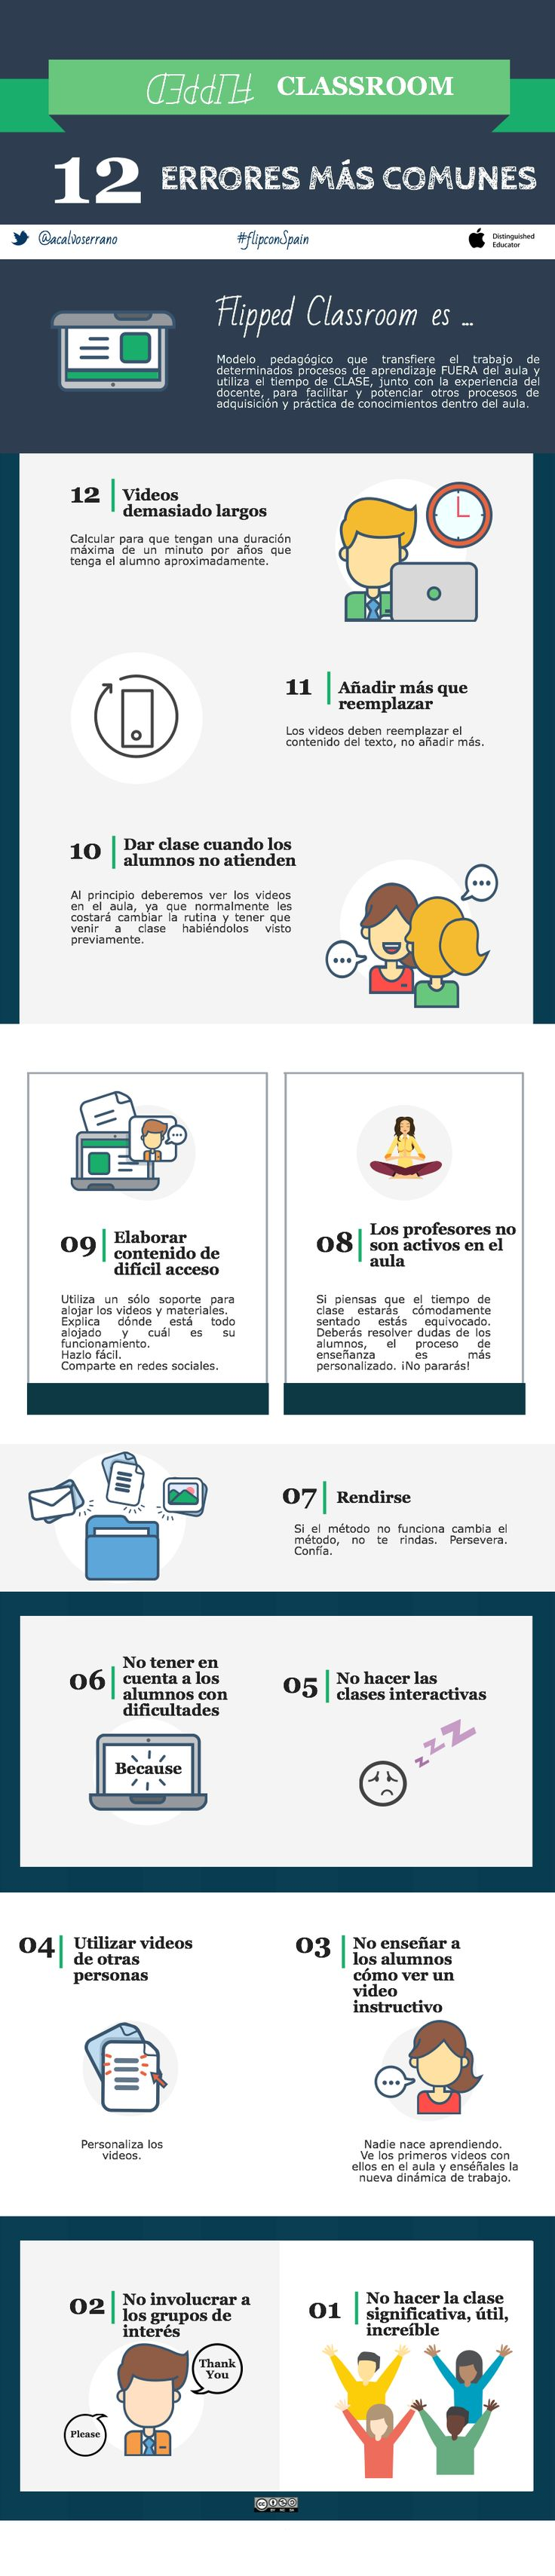 12 errores más comunes en Flipped ClassRoom #infografía